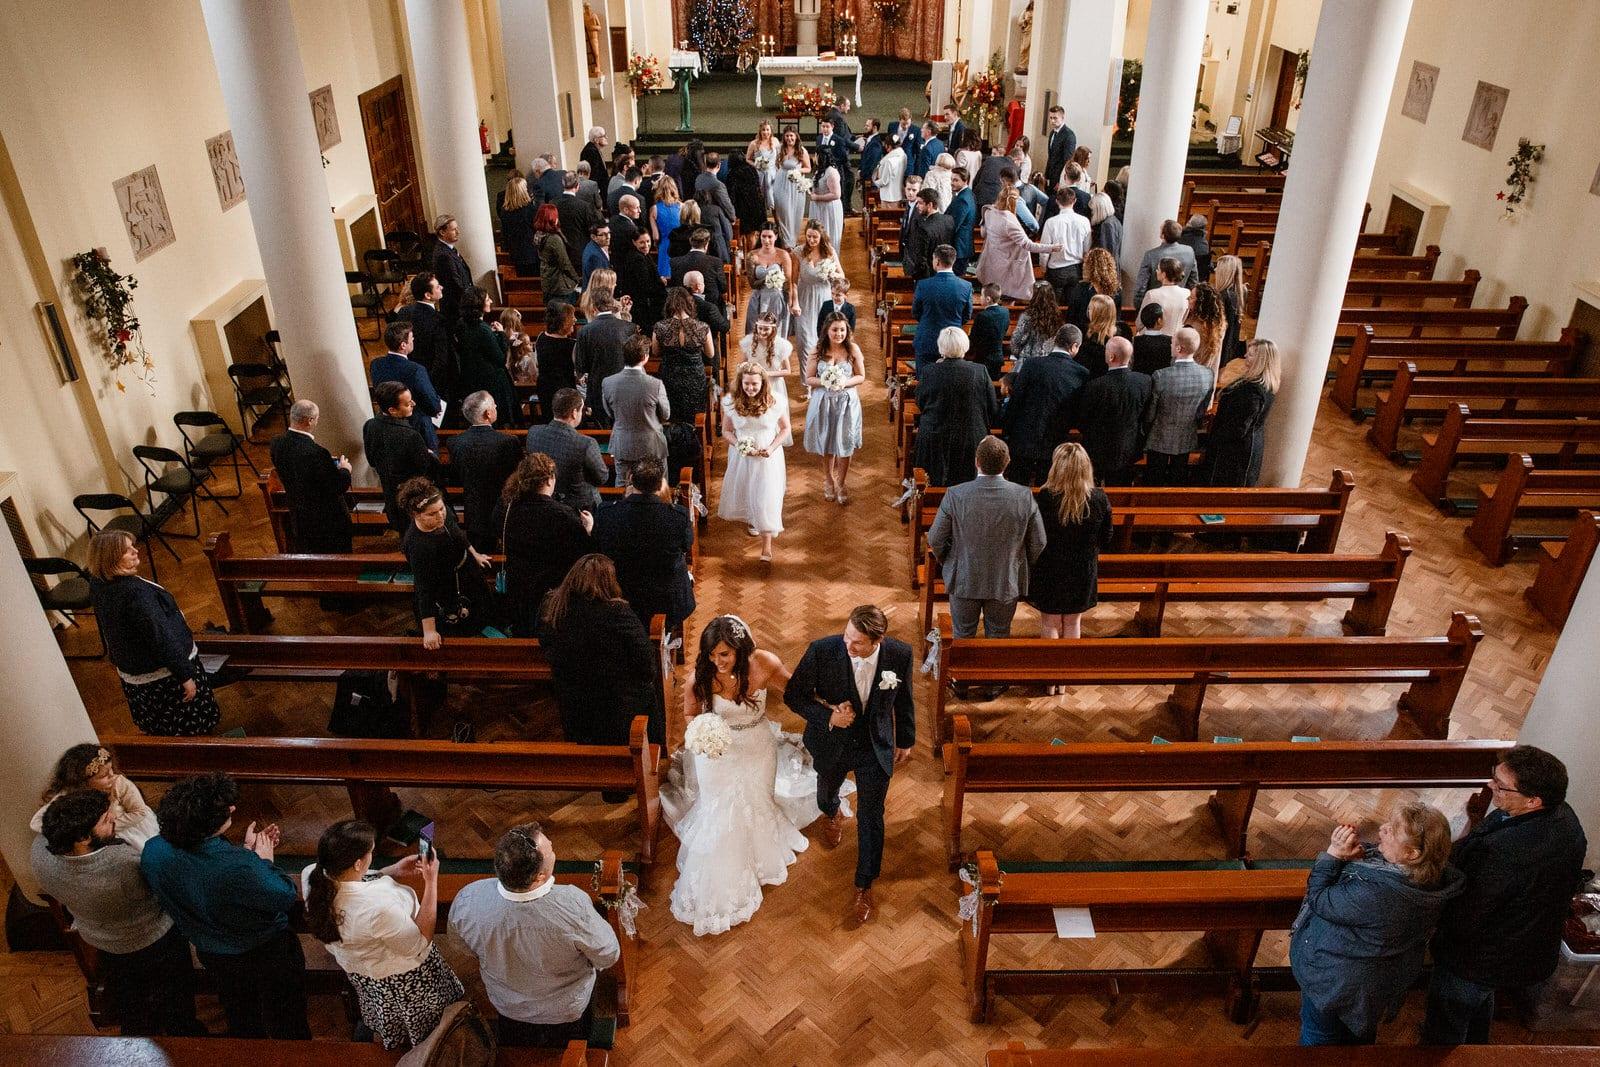 aerial shot of bride and groom leaving church wedding